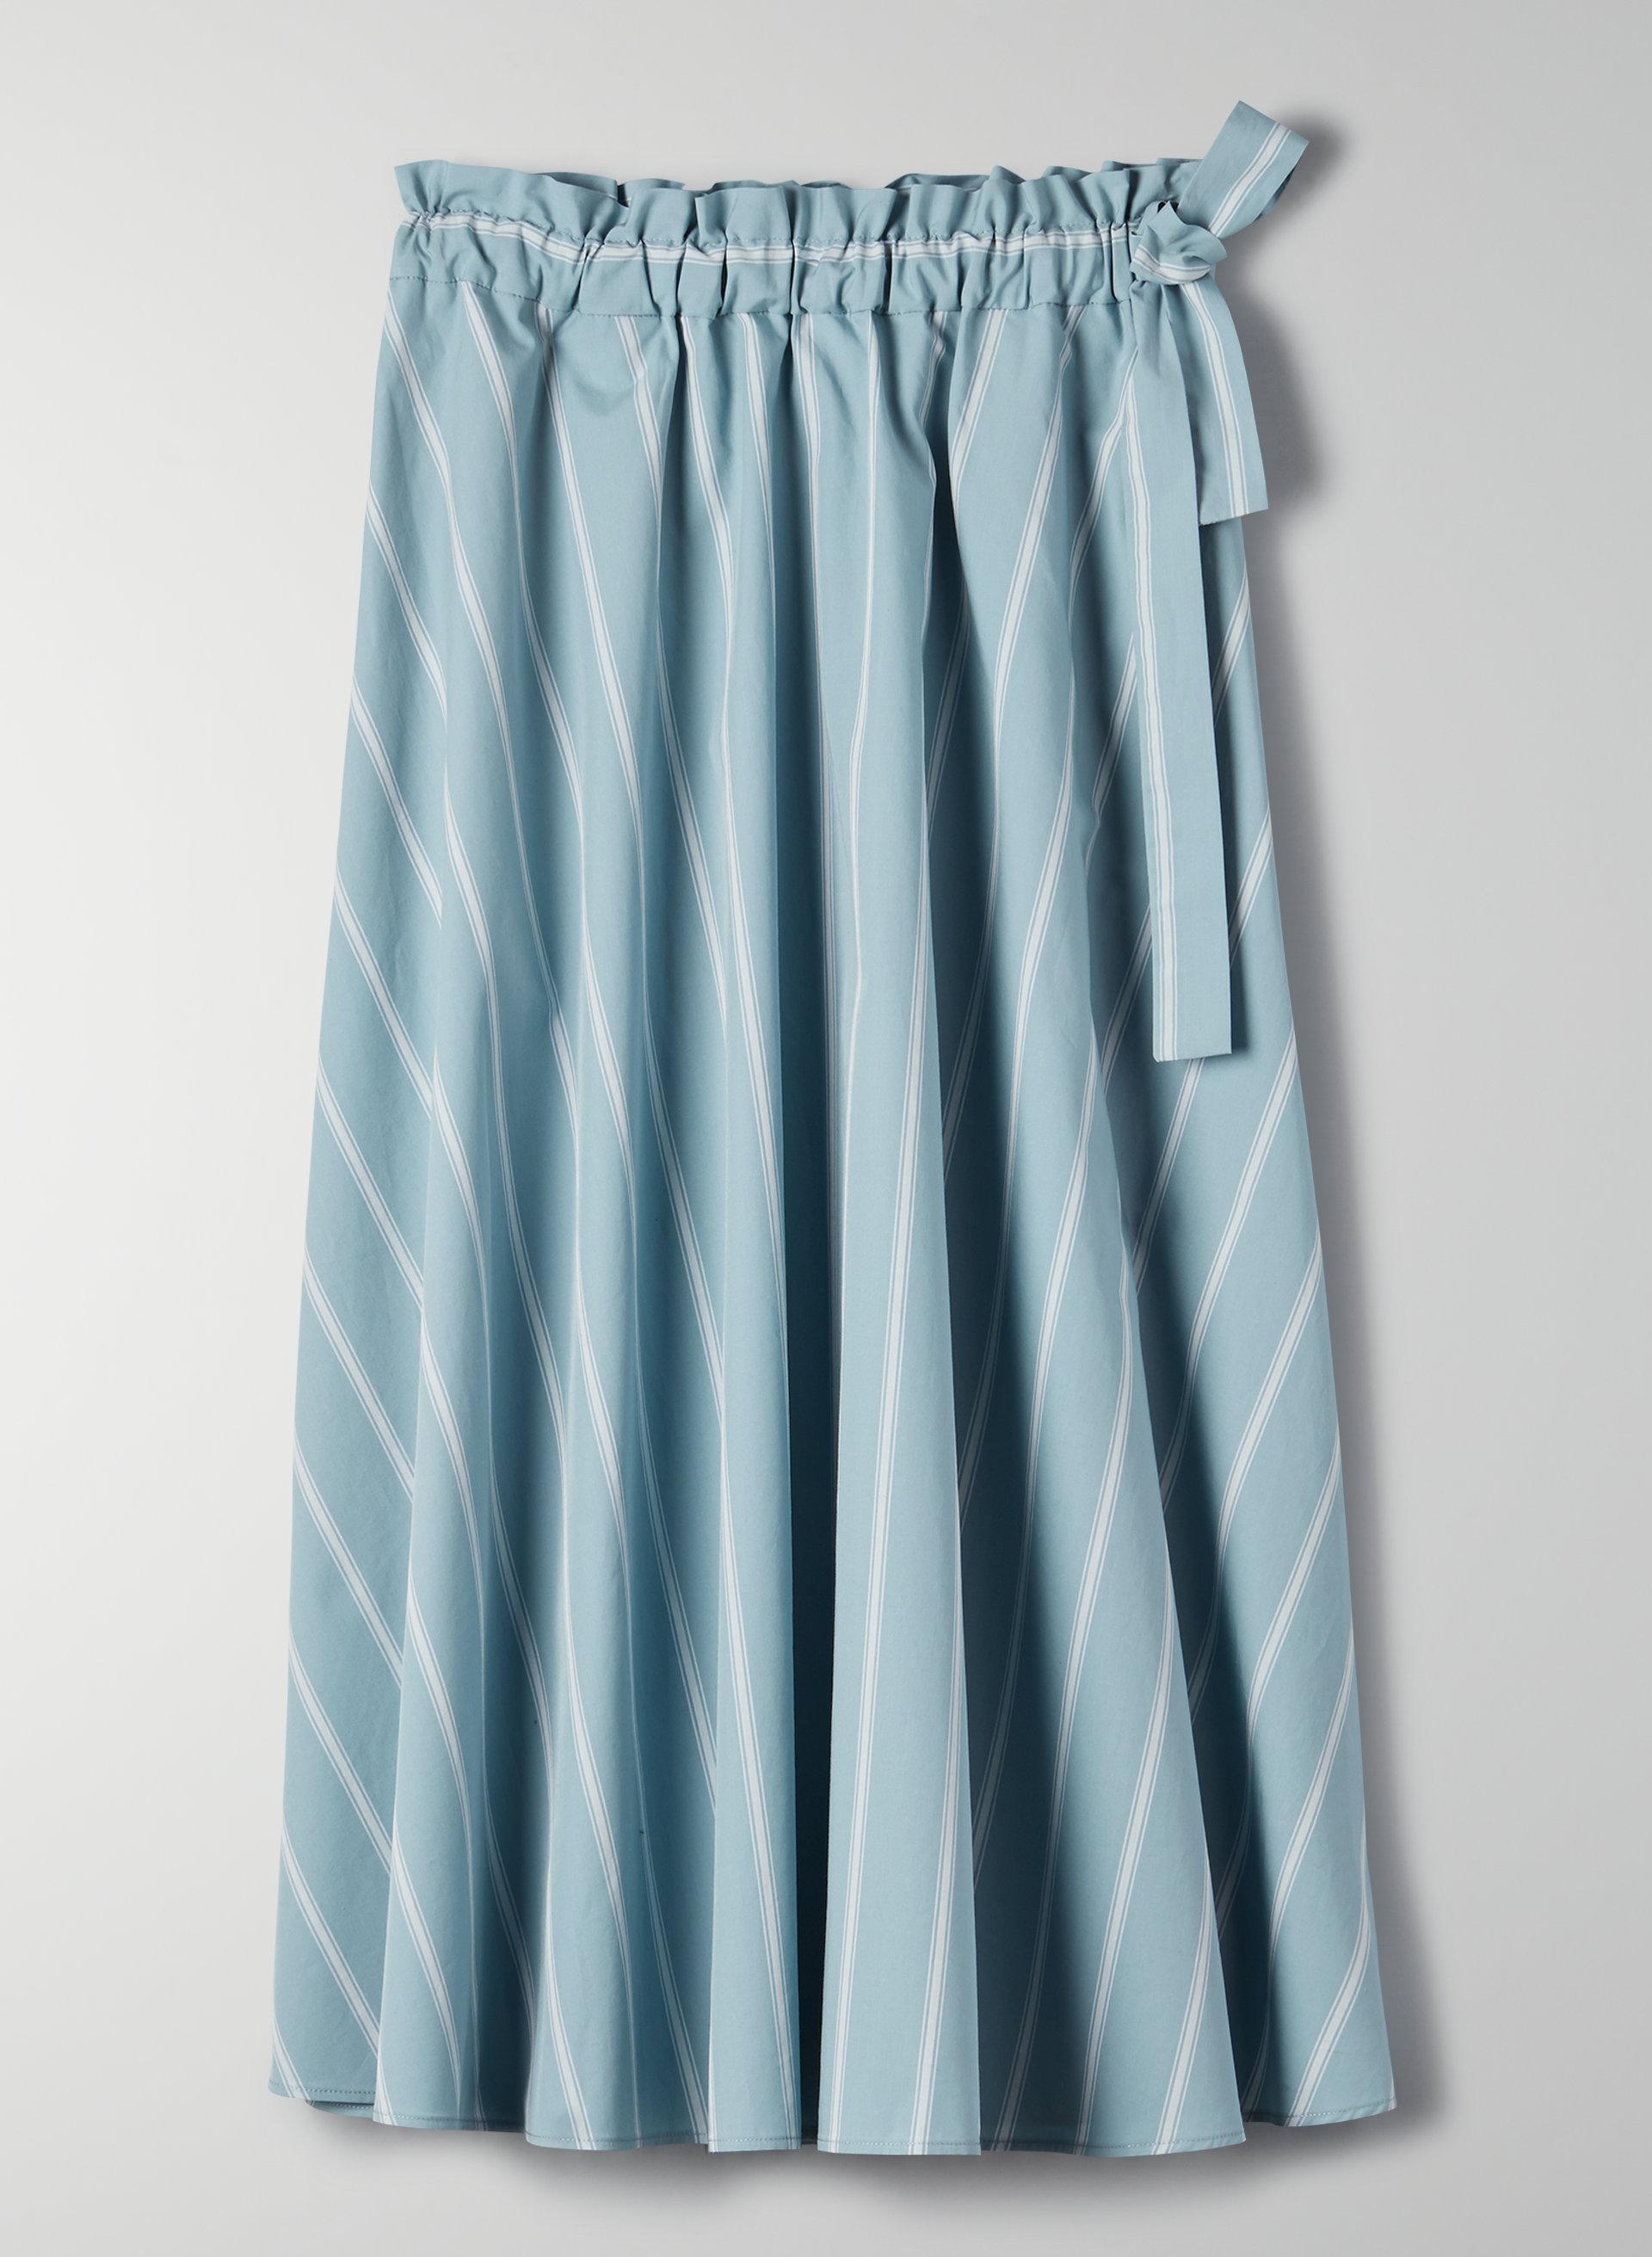 c0ec88916a CHAMBLY SKIRT - Striped, A-line midi skirt